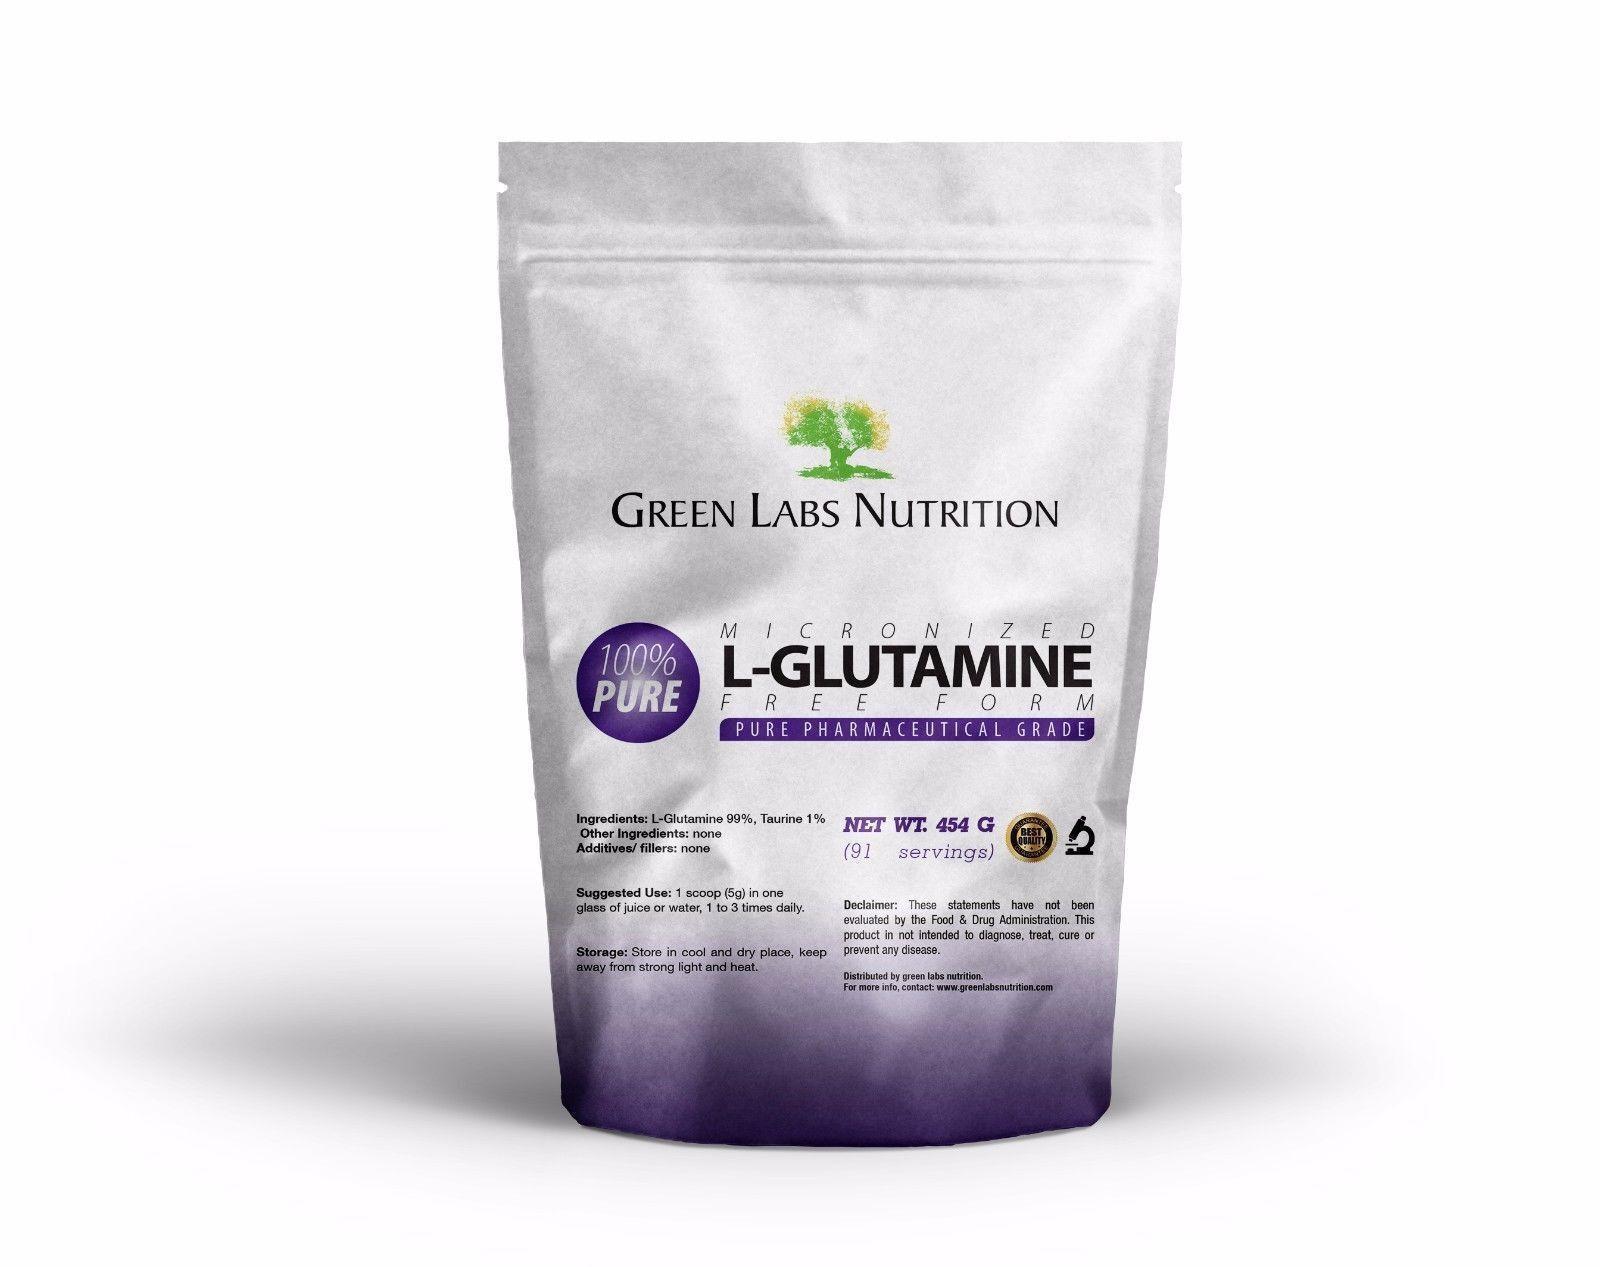 L-GLUTAMINE POWDER FREE FORM Pure AMINO ACIDS